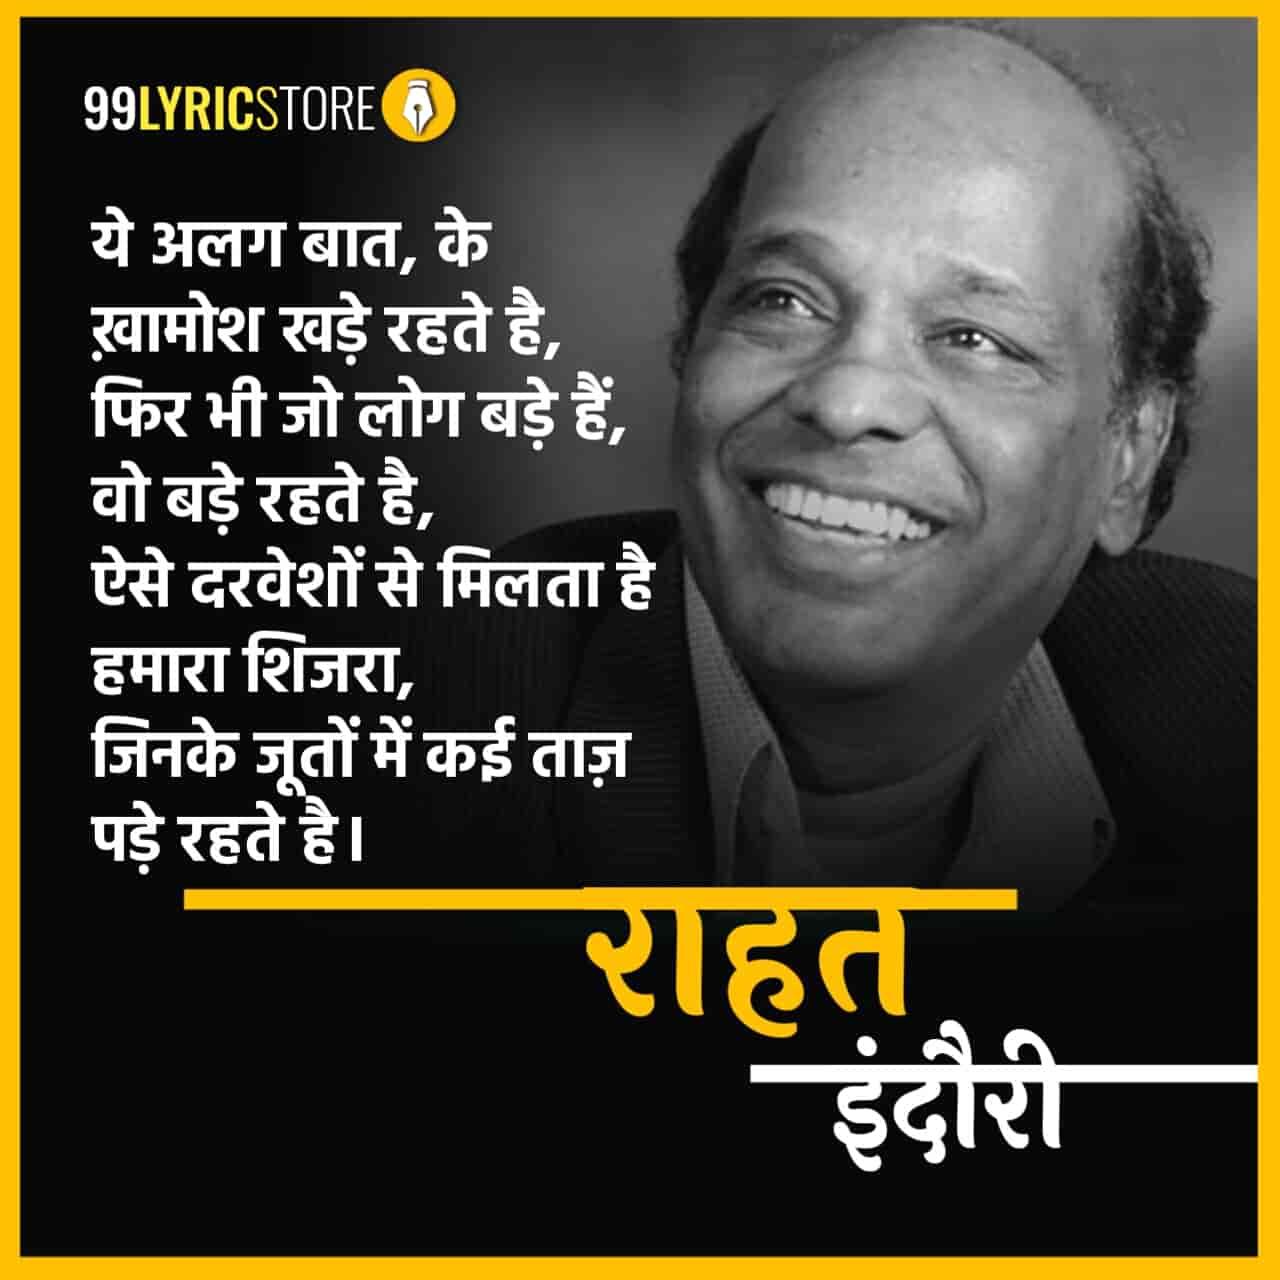 This beautiful Ghazal 'Jinke Juton Me Kai Taj Pade Rehte Hain' has written and performed by Rahat Indori.